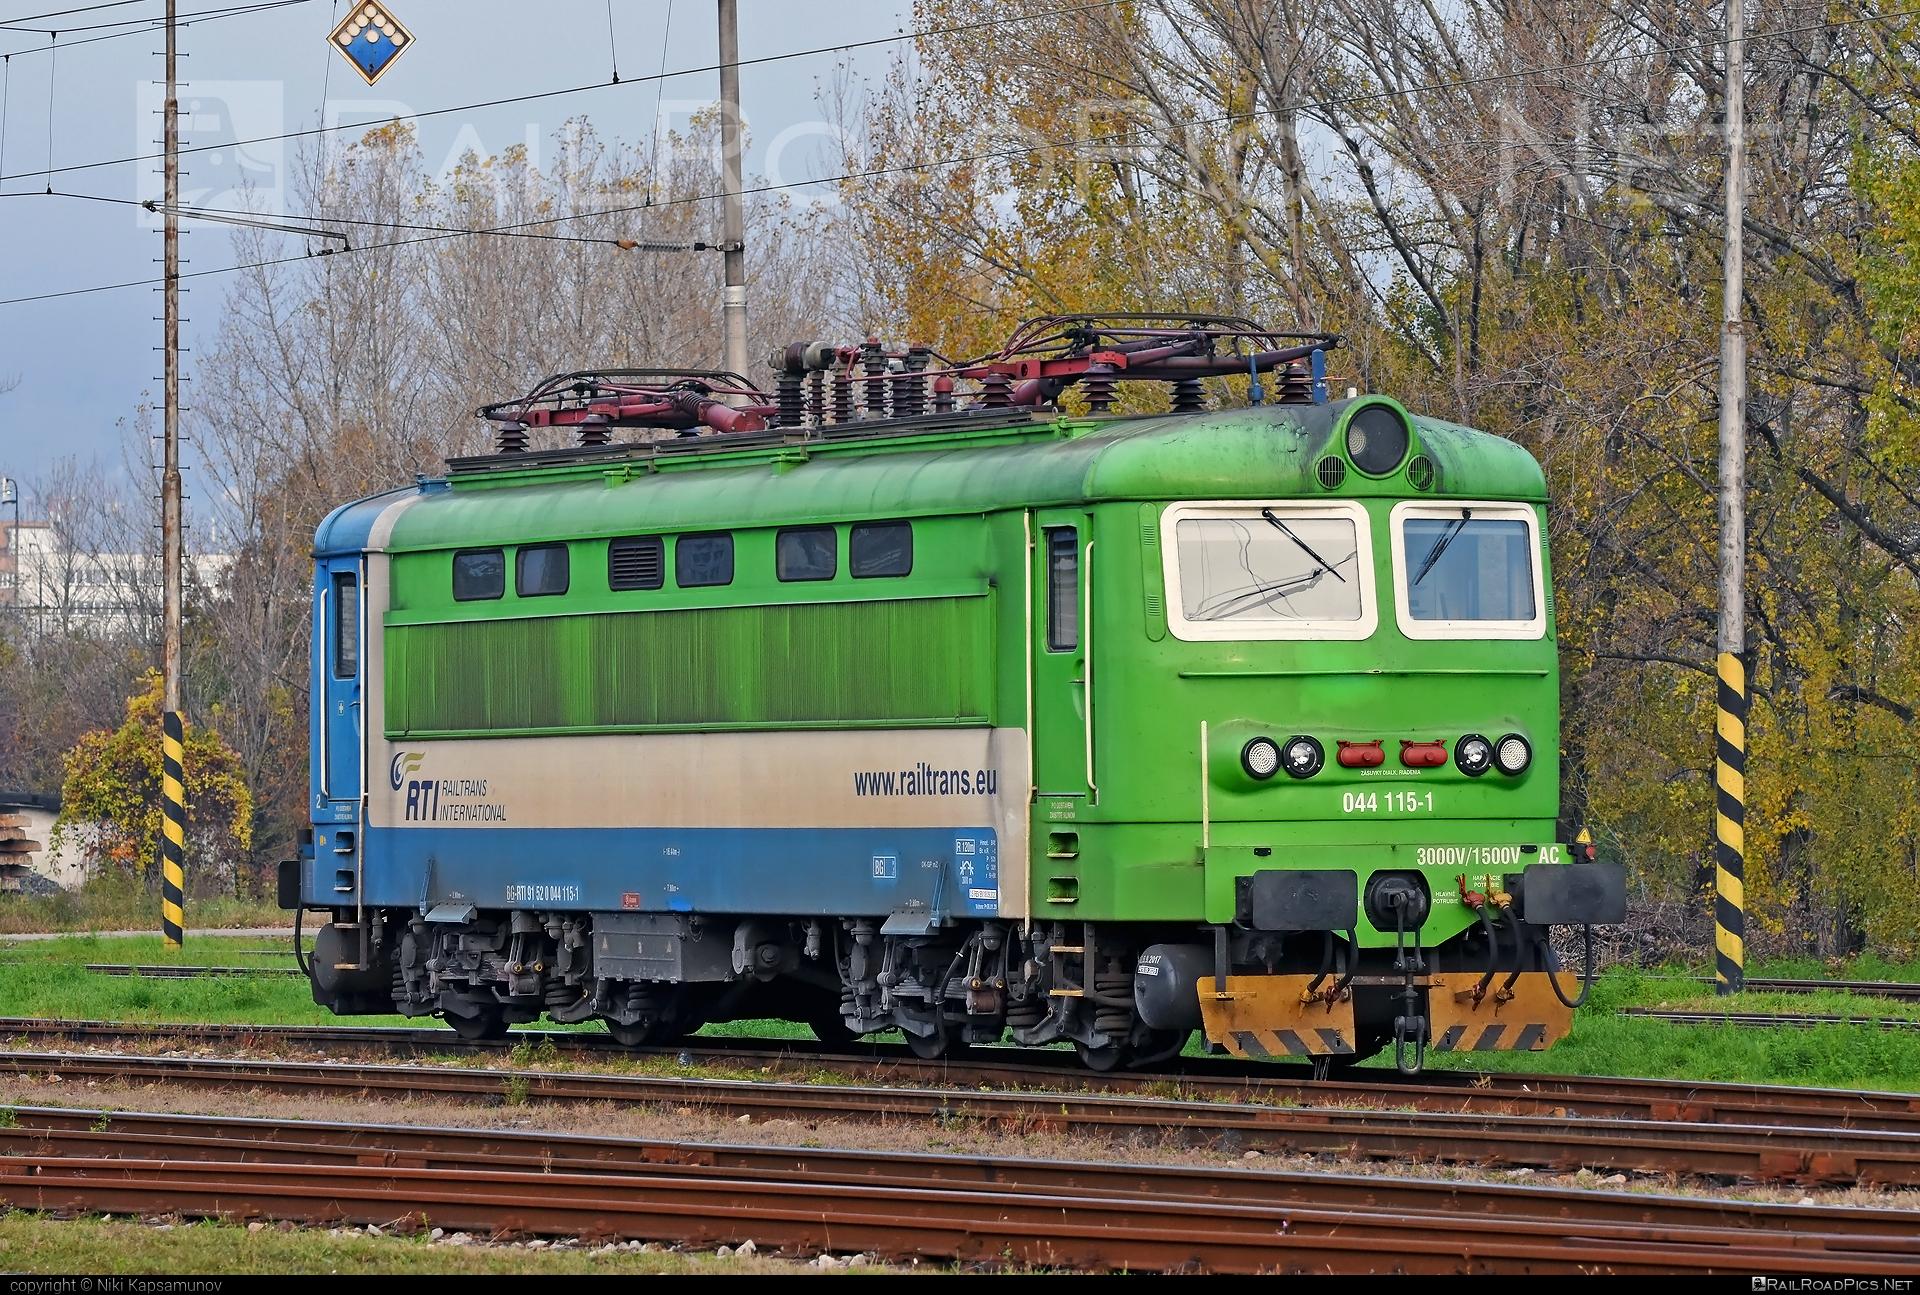 Škoda 73E - 044 115-1 operated by Railtrans International, s.r.o #RailtransInternational #locomotive242 #plechac #rti #skoda #skoda73e